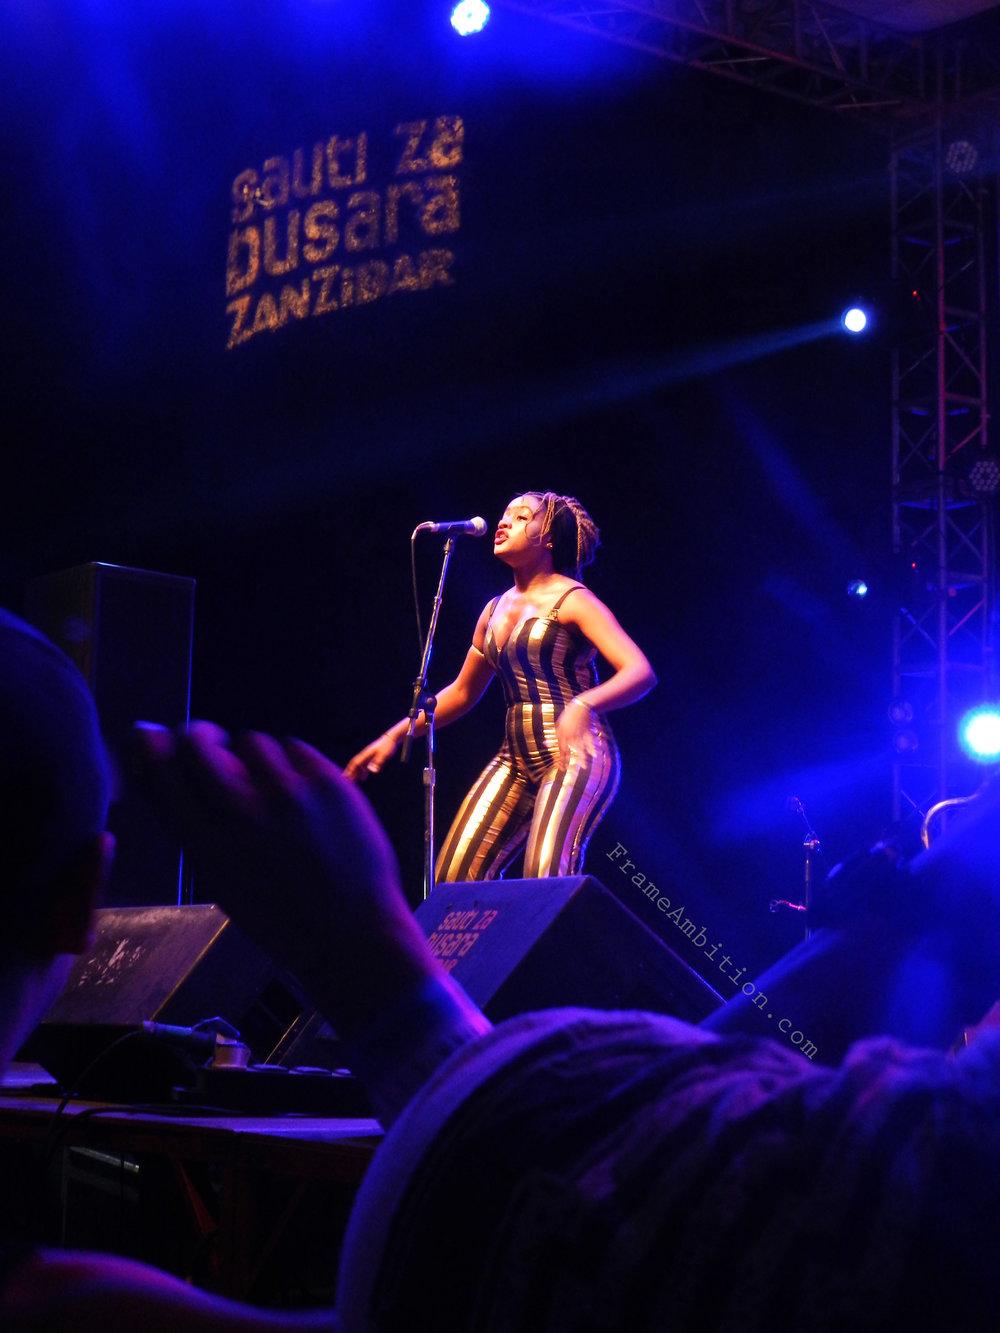 sauti_za_busara_singer_stage